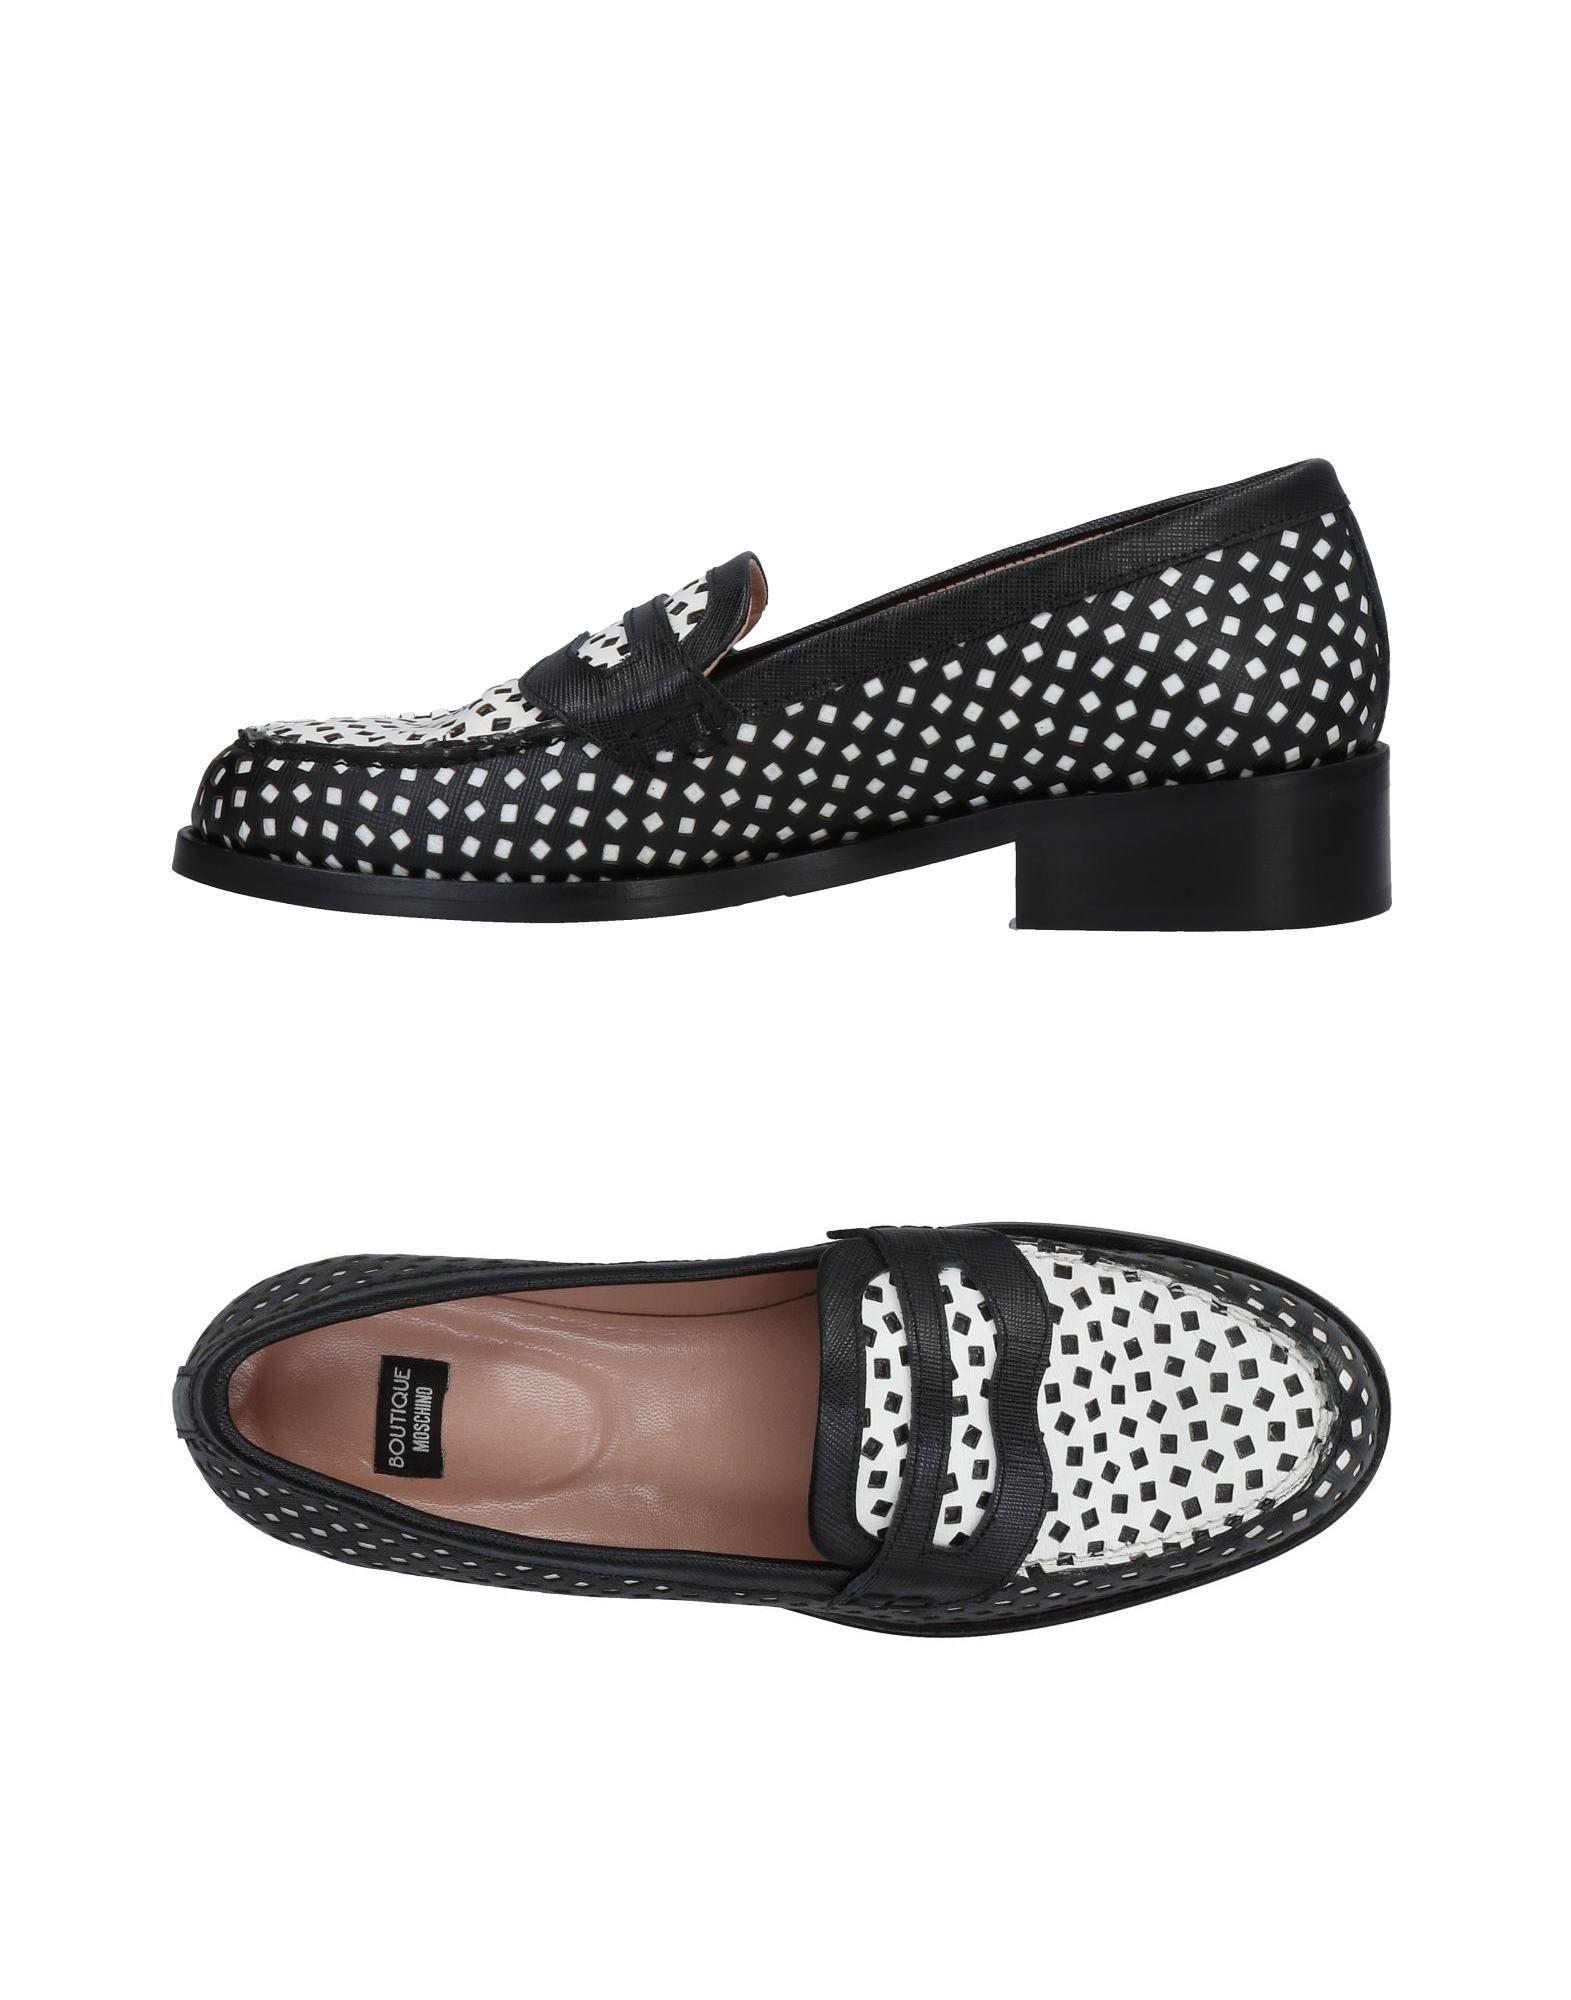 Boutique Moschino Mokassins Damen  11486259AG Neue Neue 11486259AG Schuhe d379da